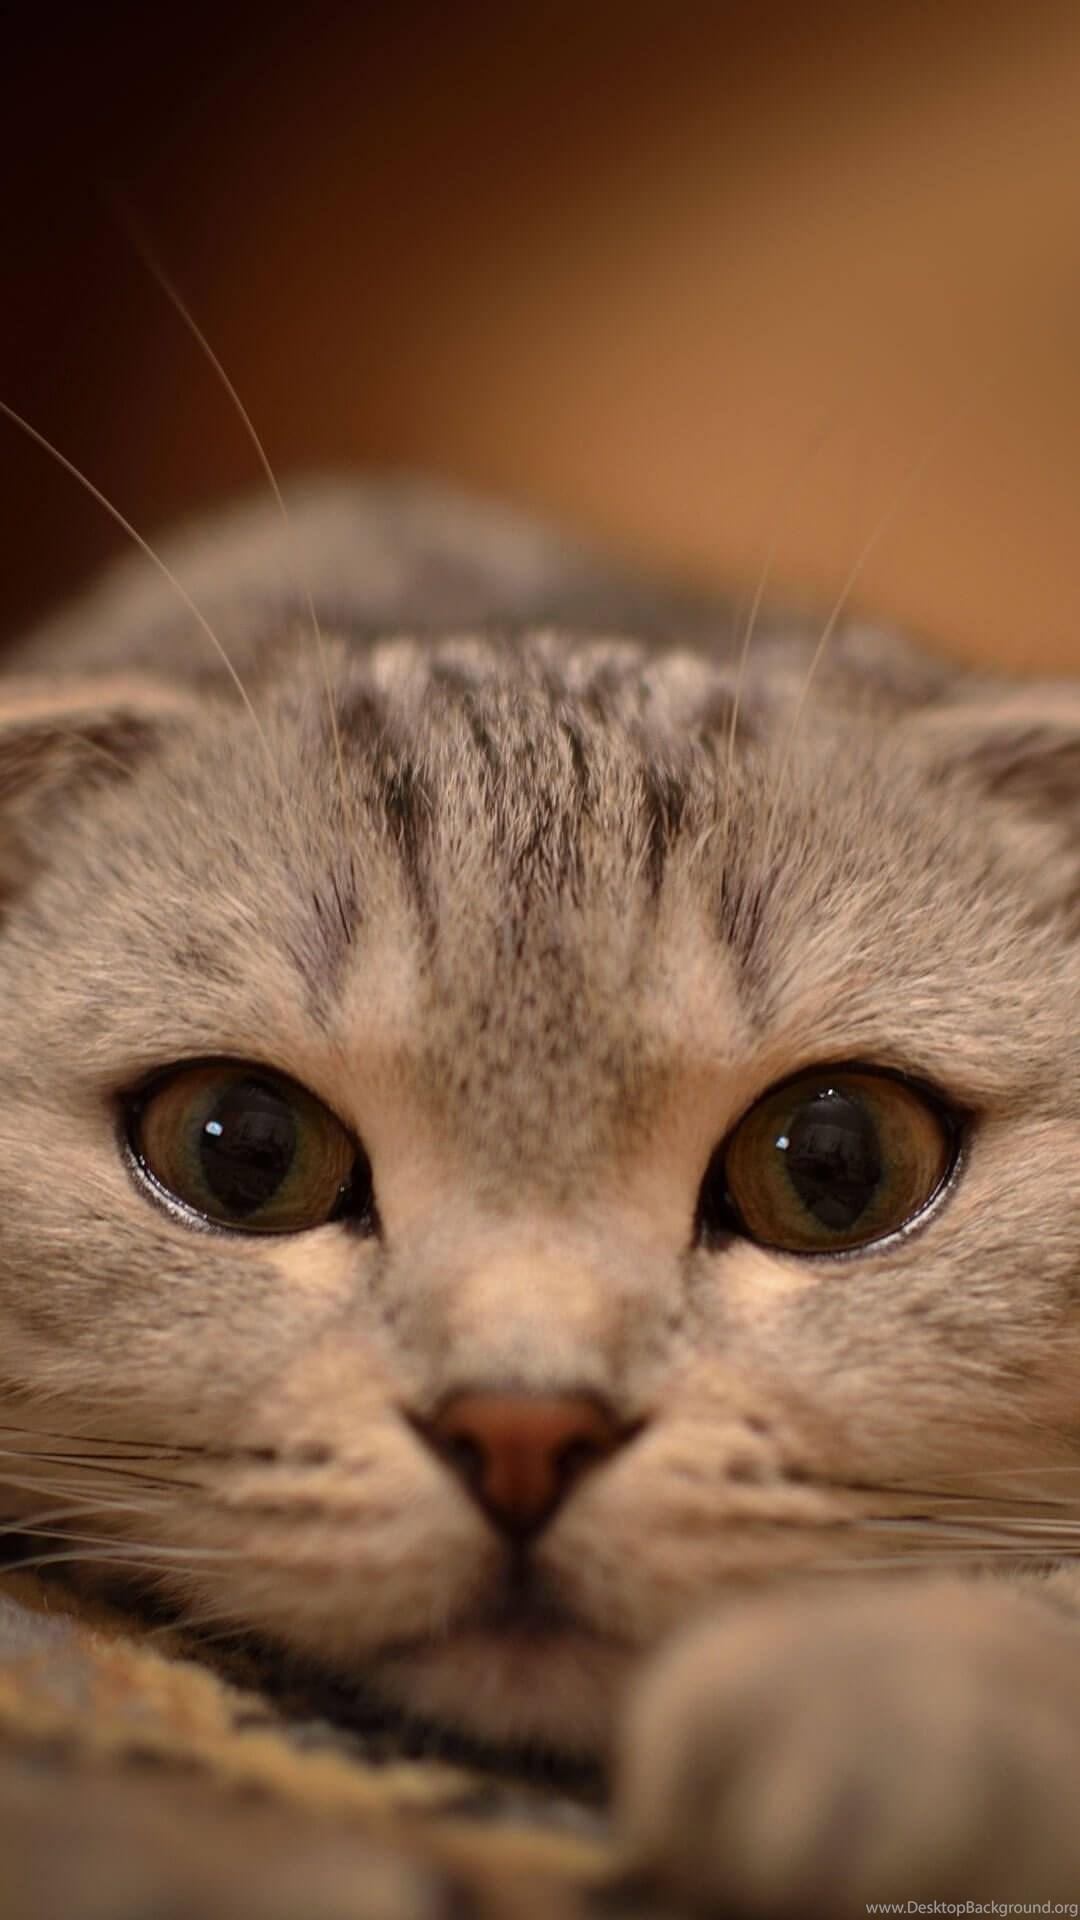 Cute Cat Wallpapers For Iphone 6 Plus Hd Wallpapers Iphone Desktop